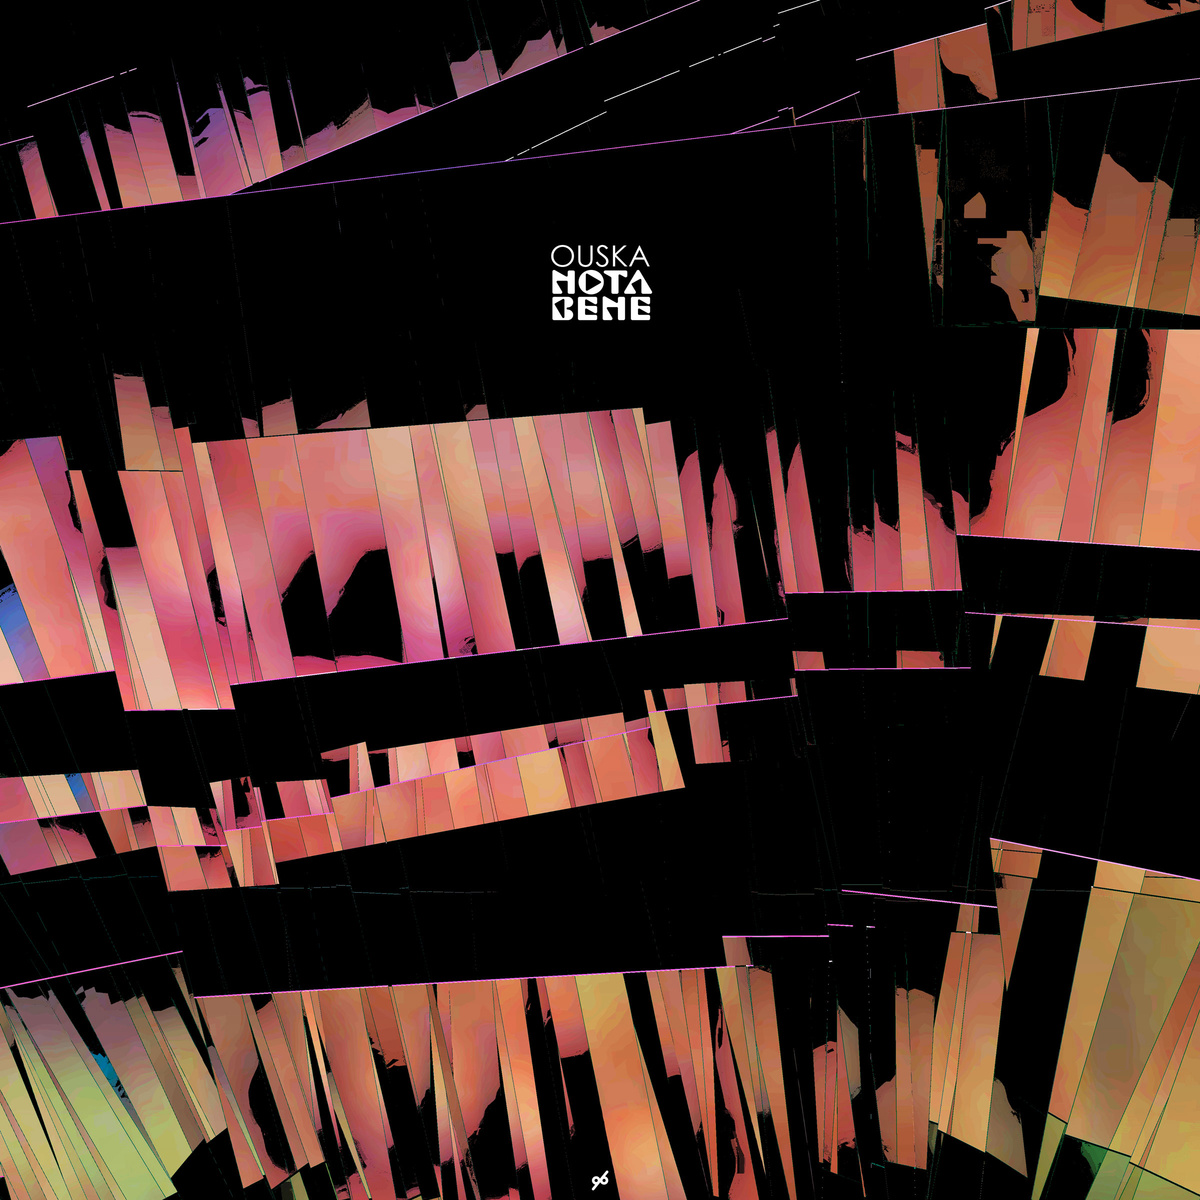 Ouska – Miam Miam Miam | Mixage & Mastering